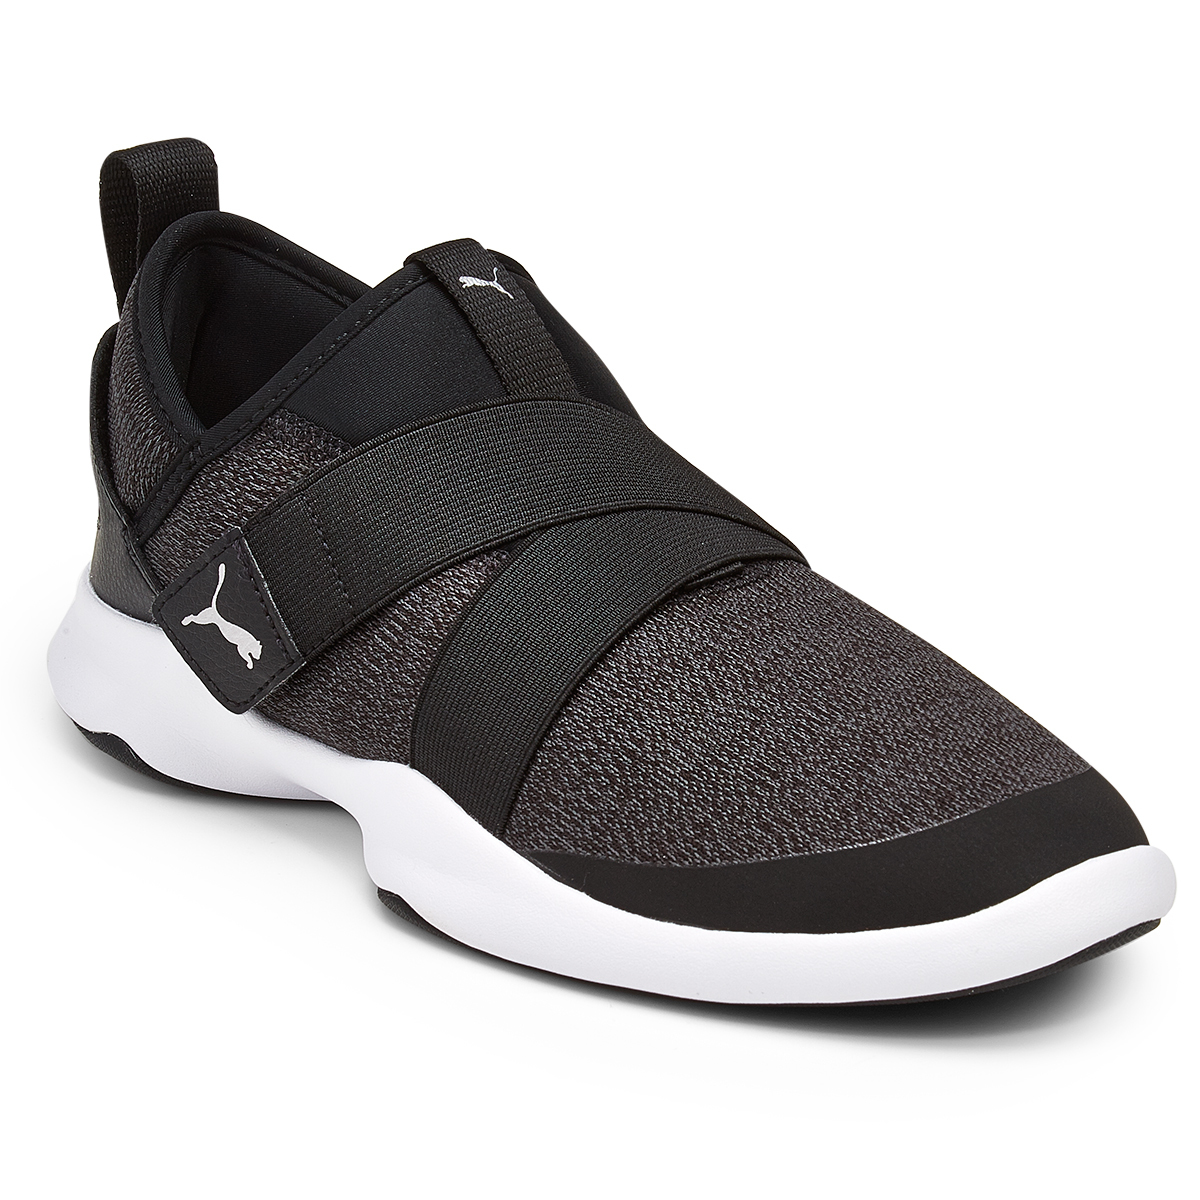 Puma Women's Dare Ac Running Shoes - Black, 7.5